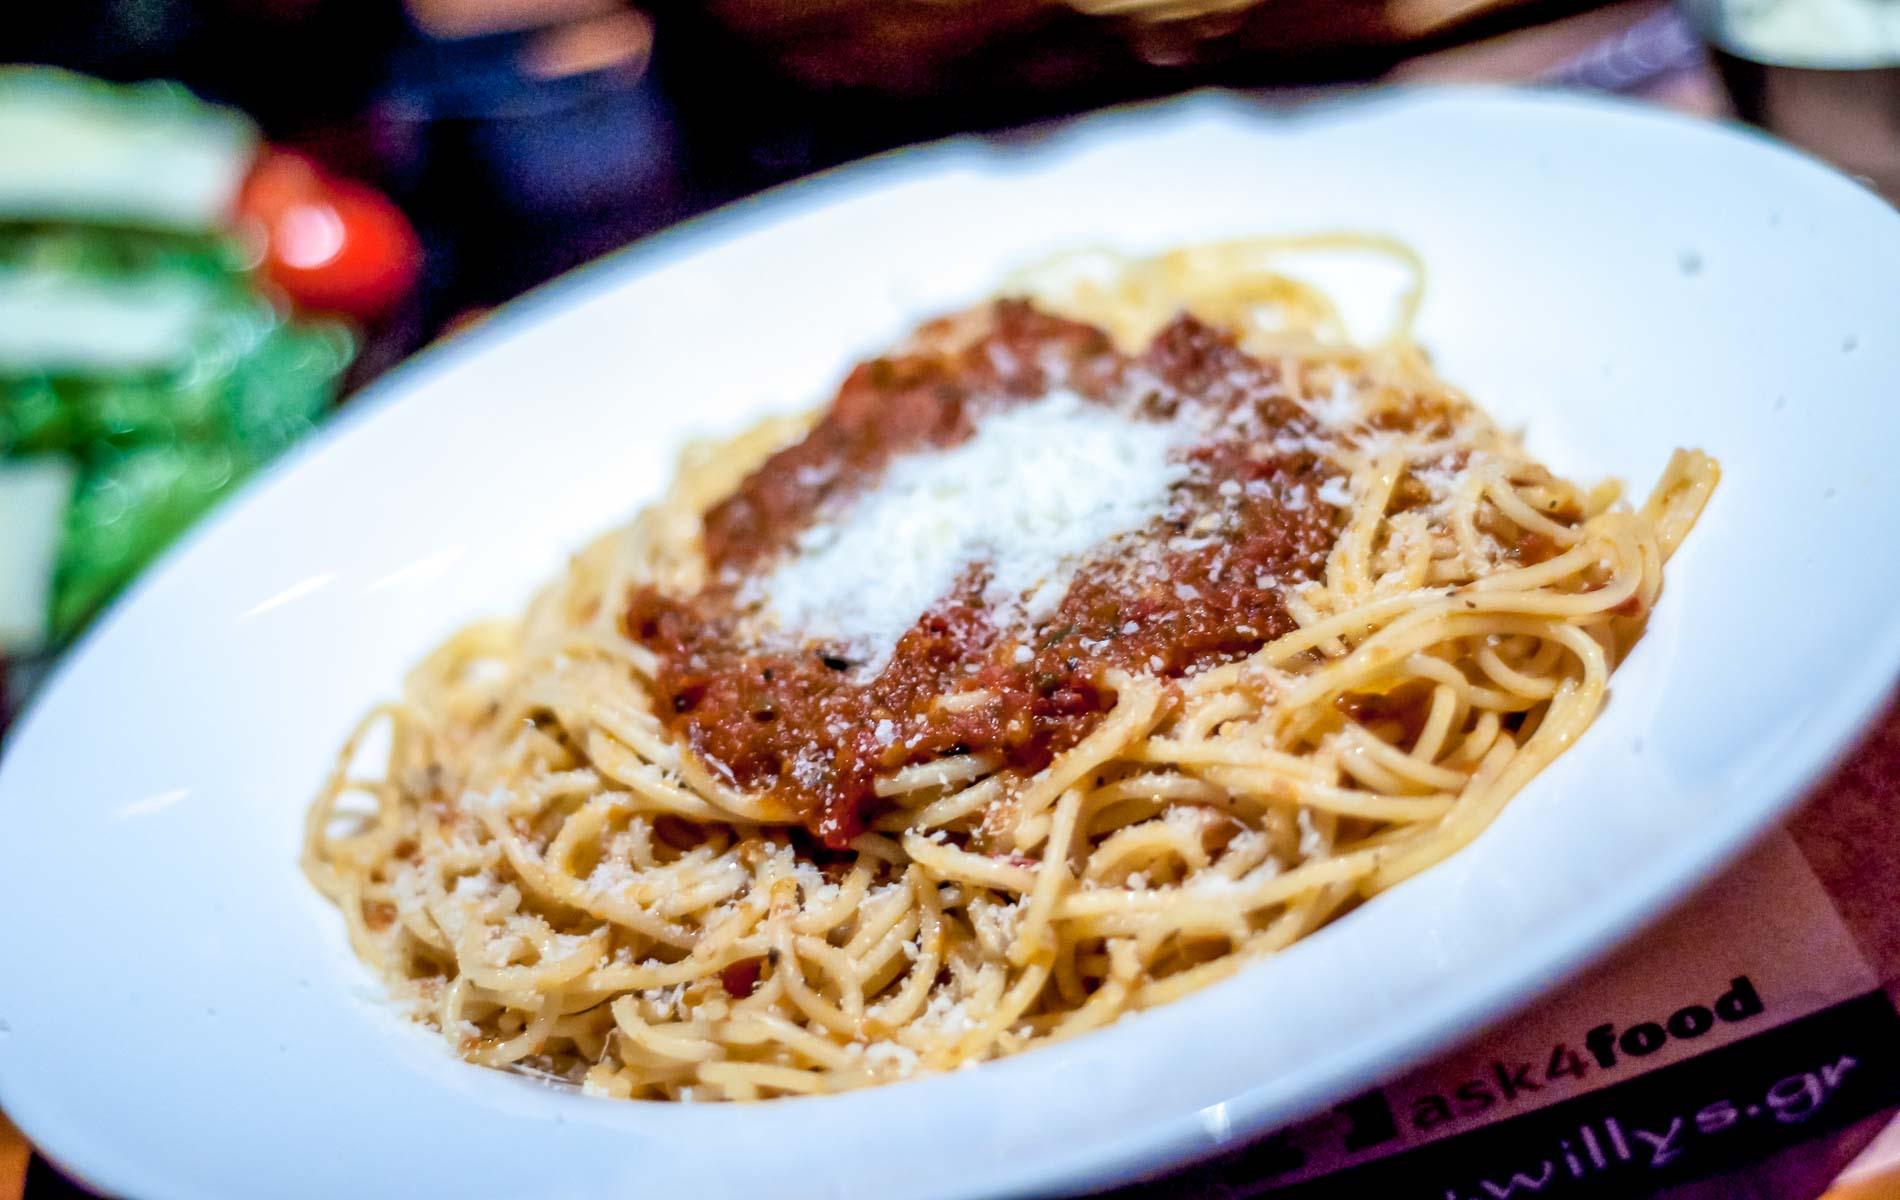 #pasta, #willyspasta, #oliveoil, #freshtomato, ##napoliten, #willys